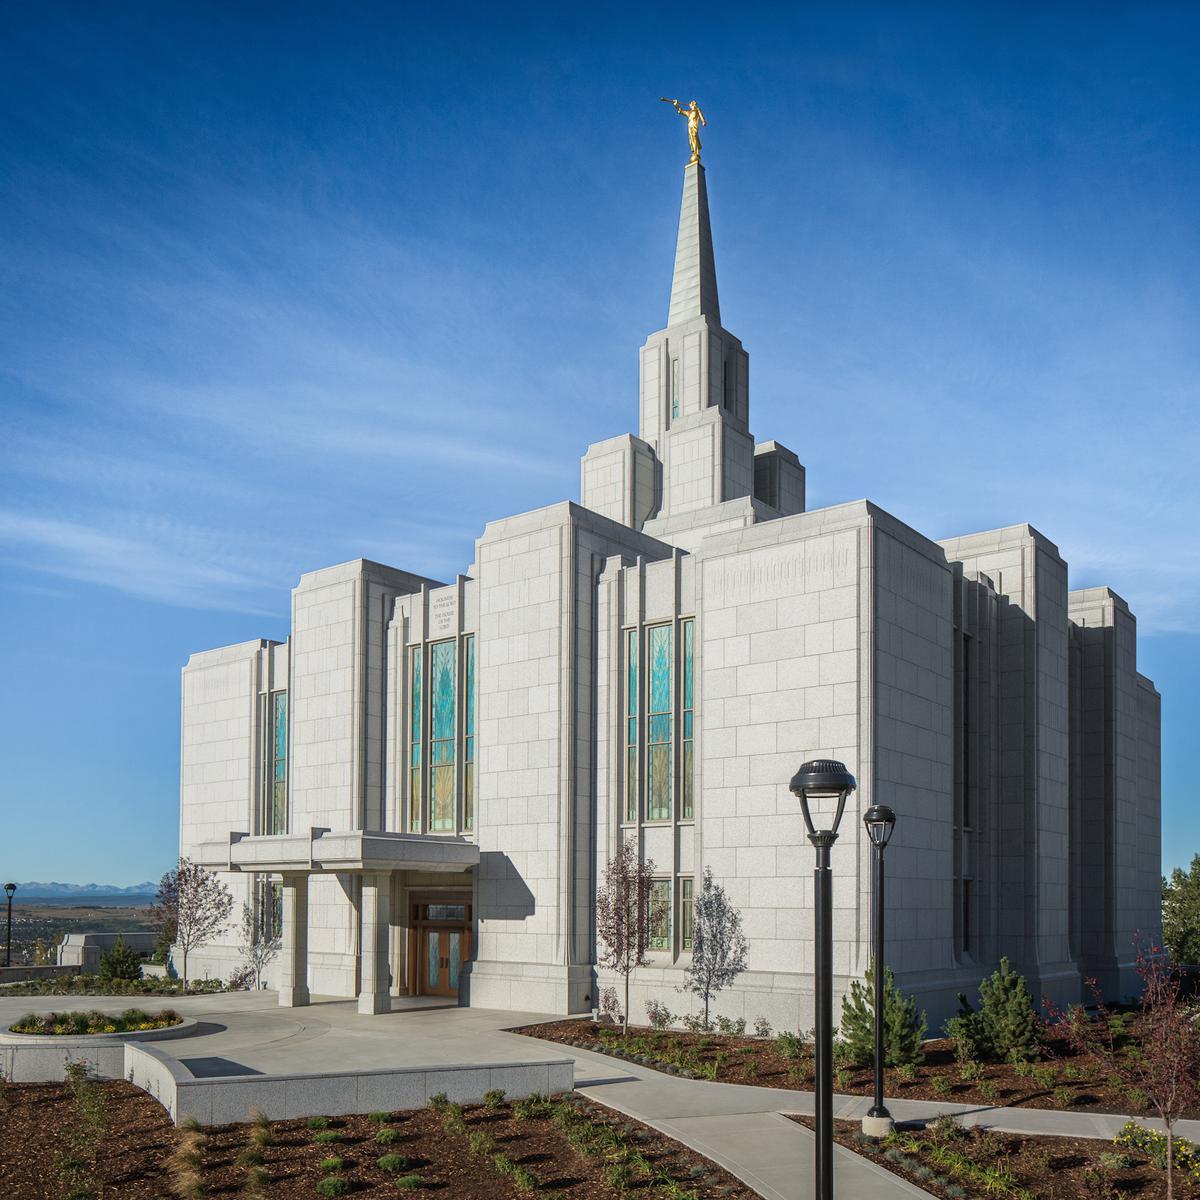 Image of the Calgary Mormon Temple